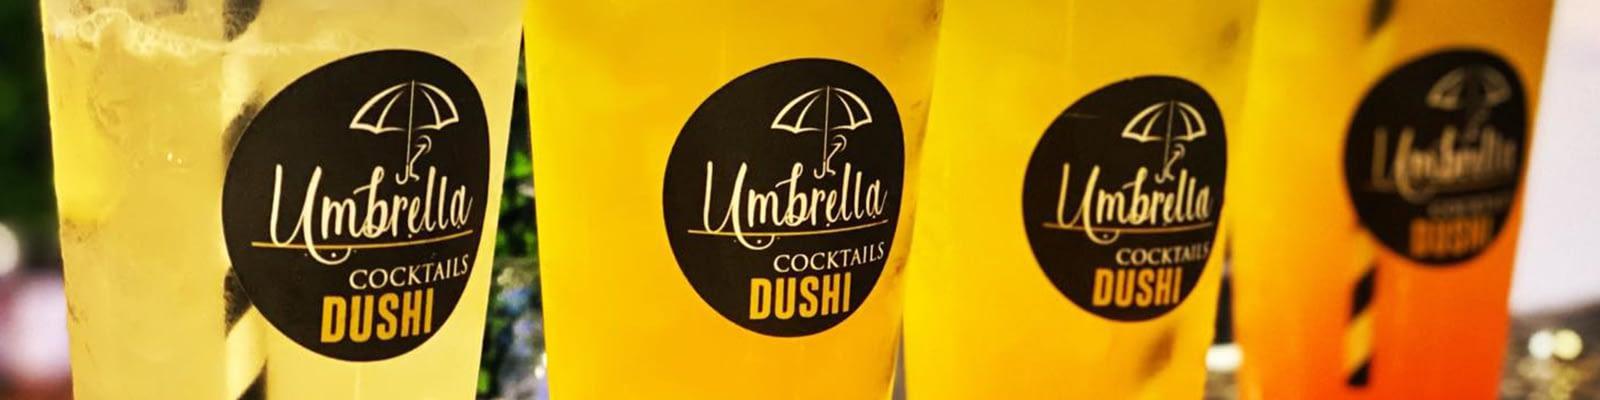 umbrella-restaurant-bonaire-slider-image-1